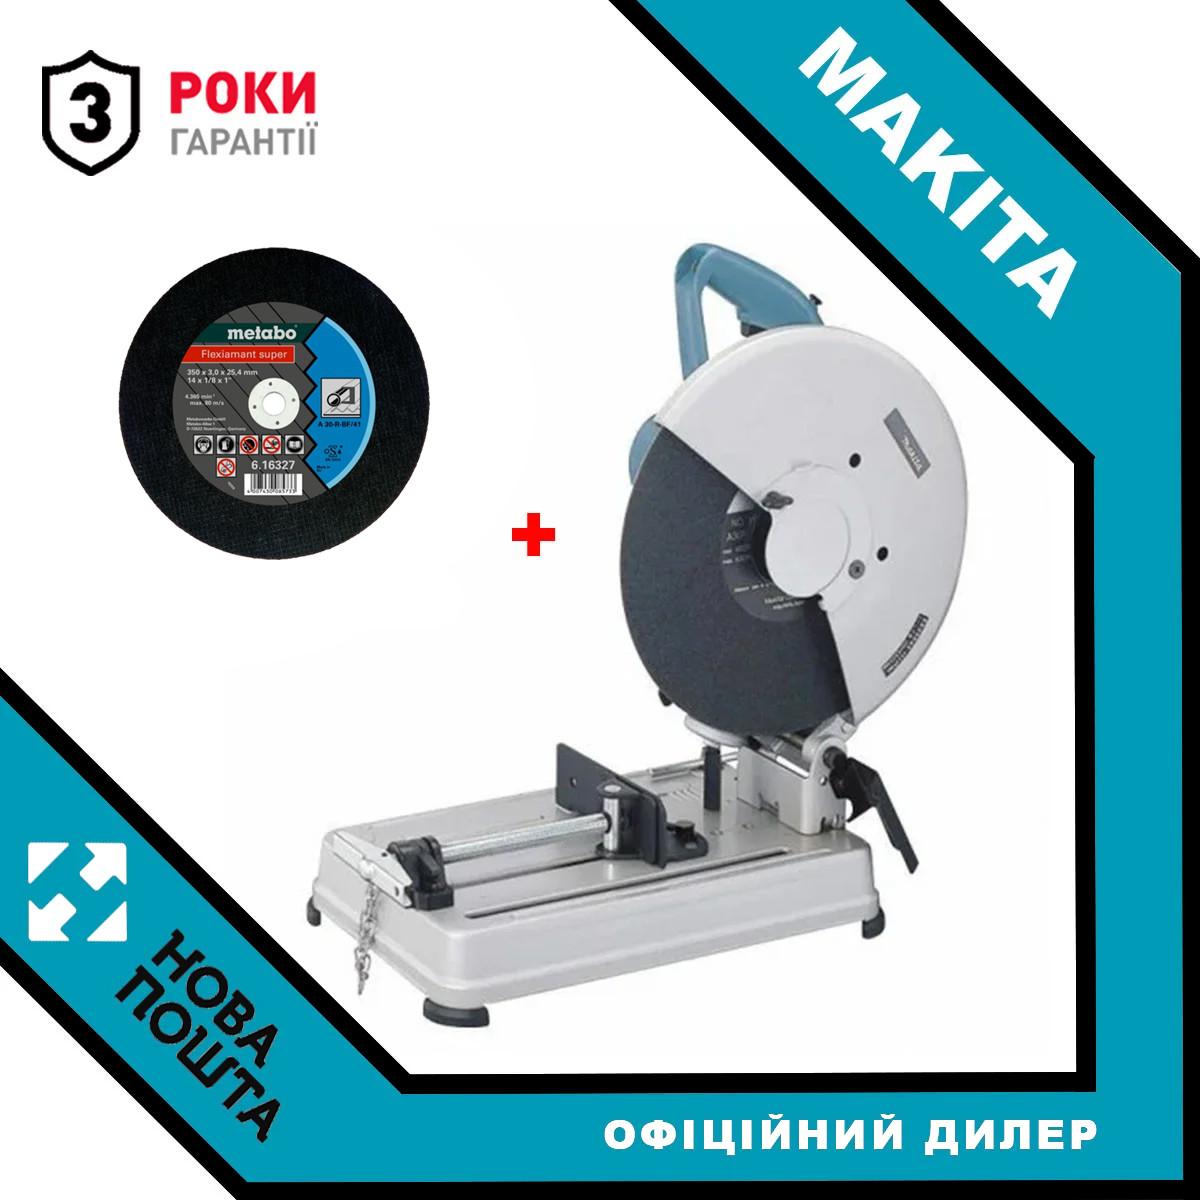 Пила монтажная Makita 2414NB + в подарок круг по металу Metabo!